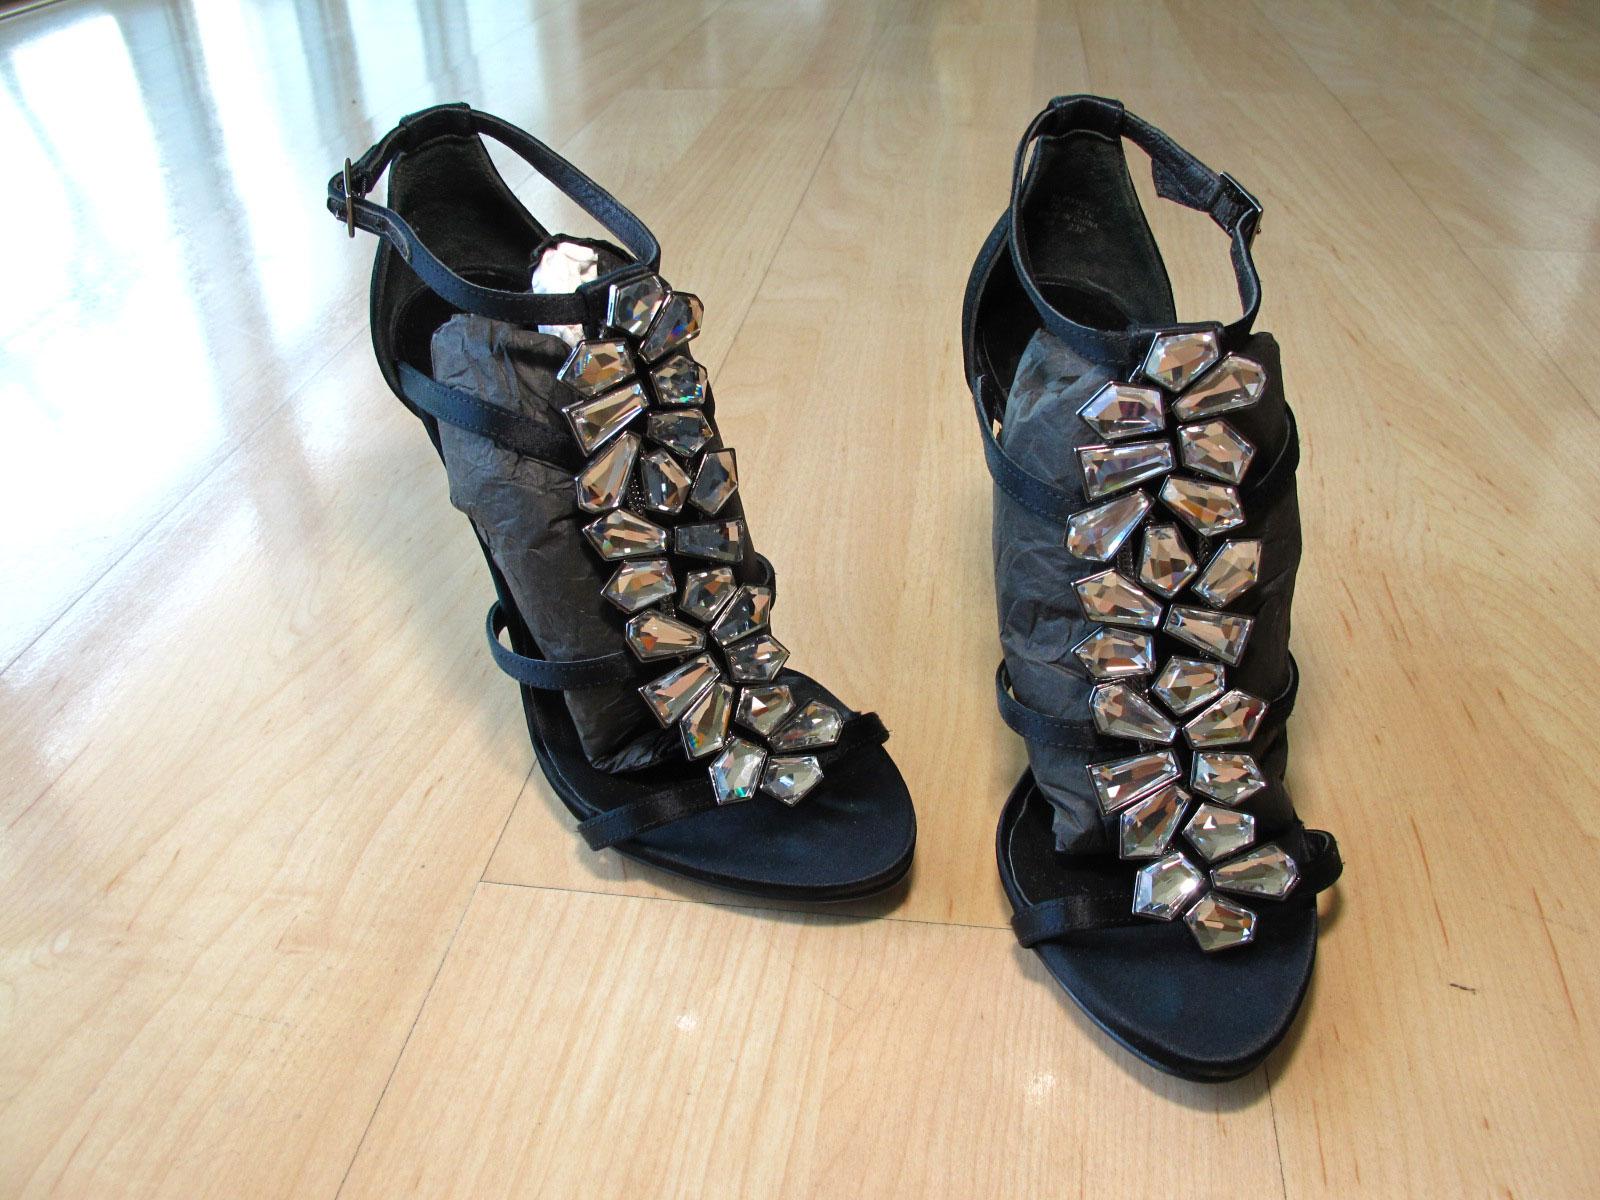 Stella Luna bling sandals